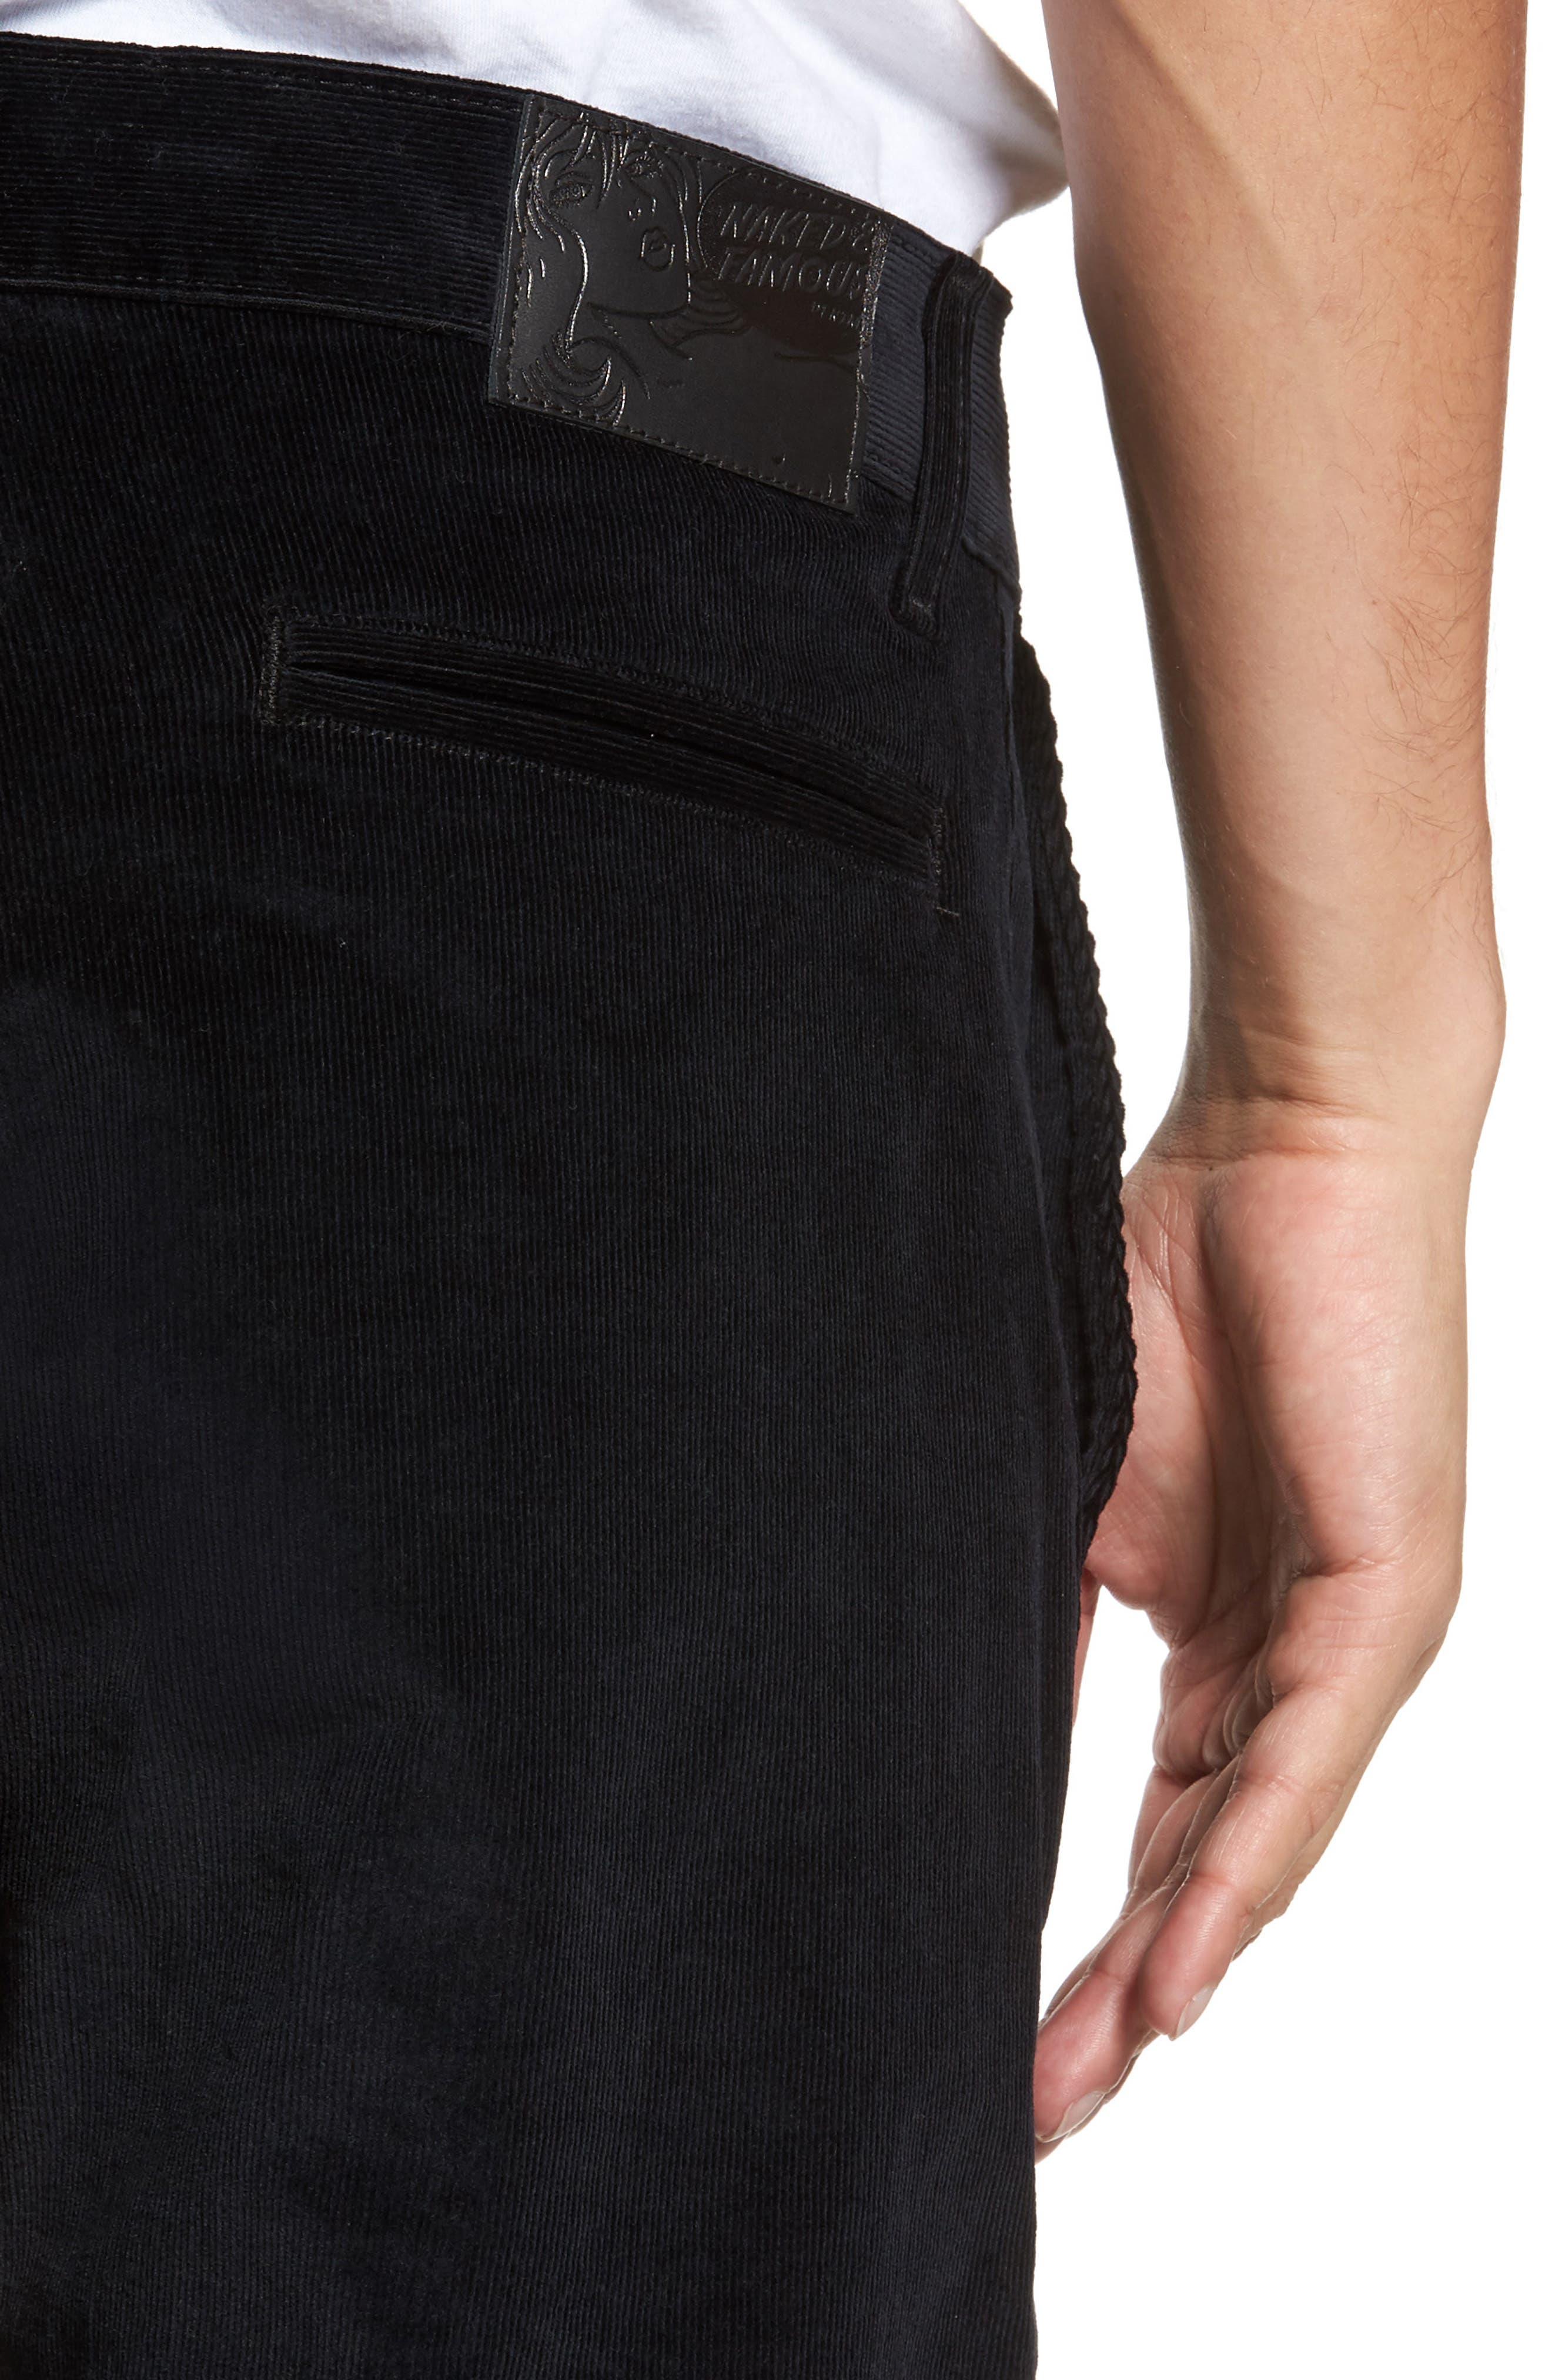 Naked & Famous Slim Chino Slim Fit Corduroy Pants,                             Alternate thumbnail 4, color,                             Black